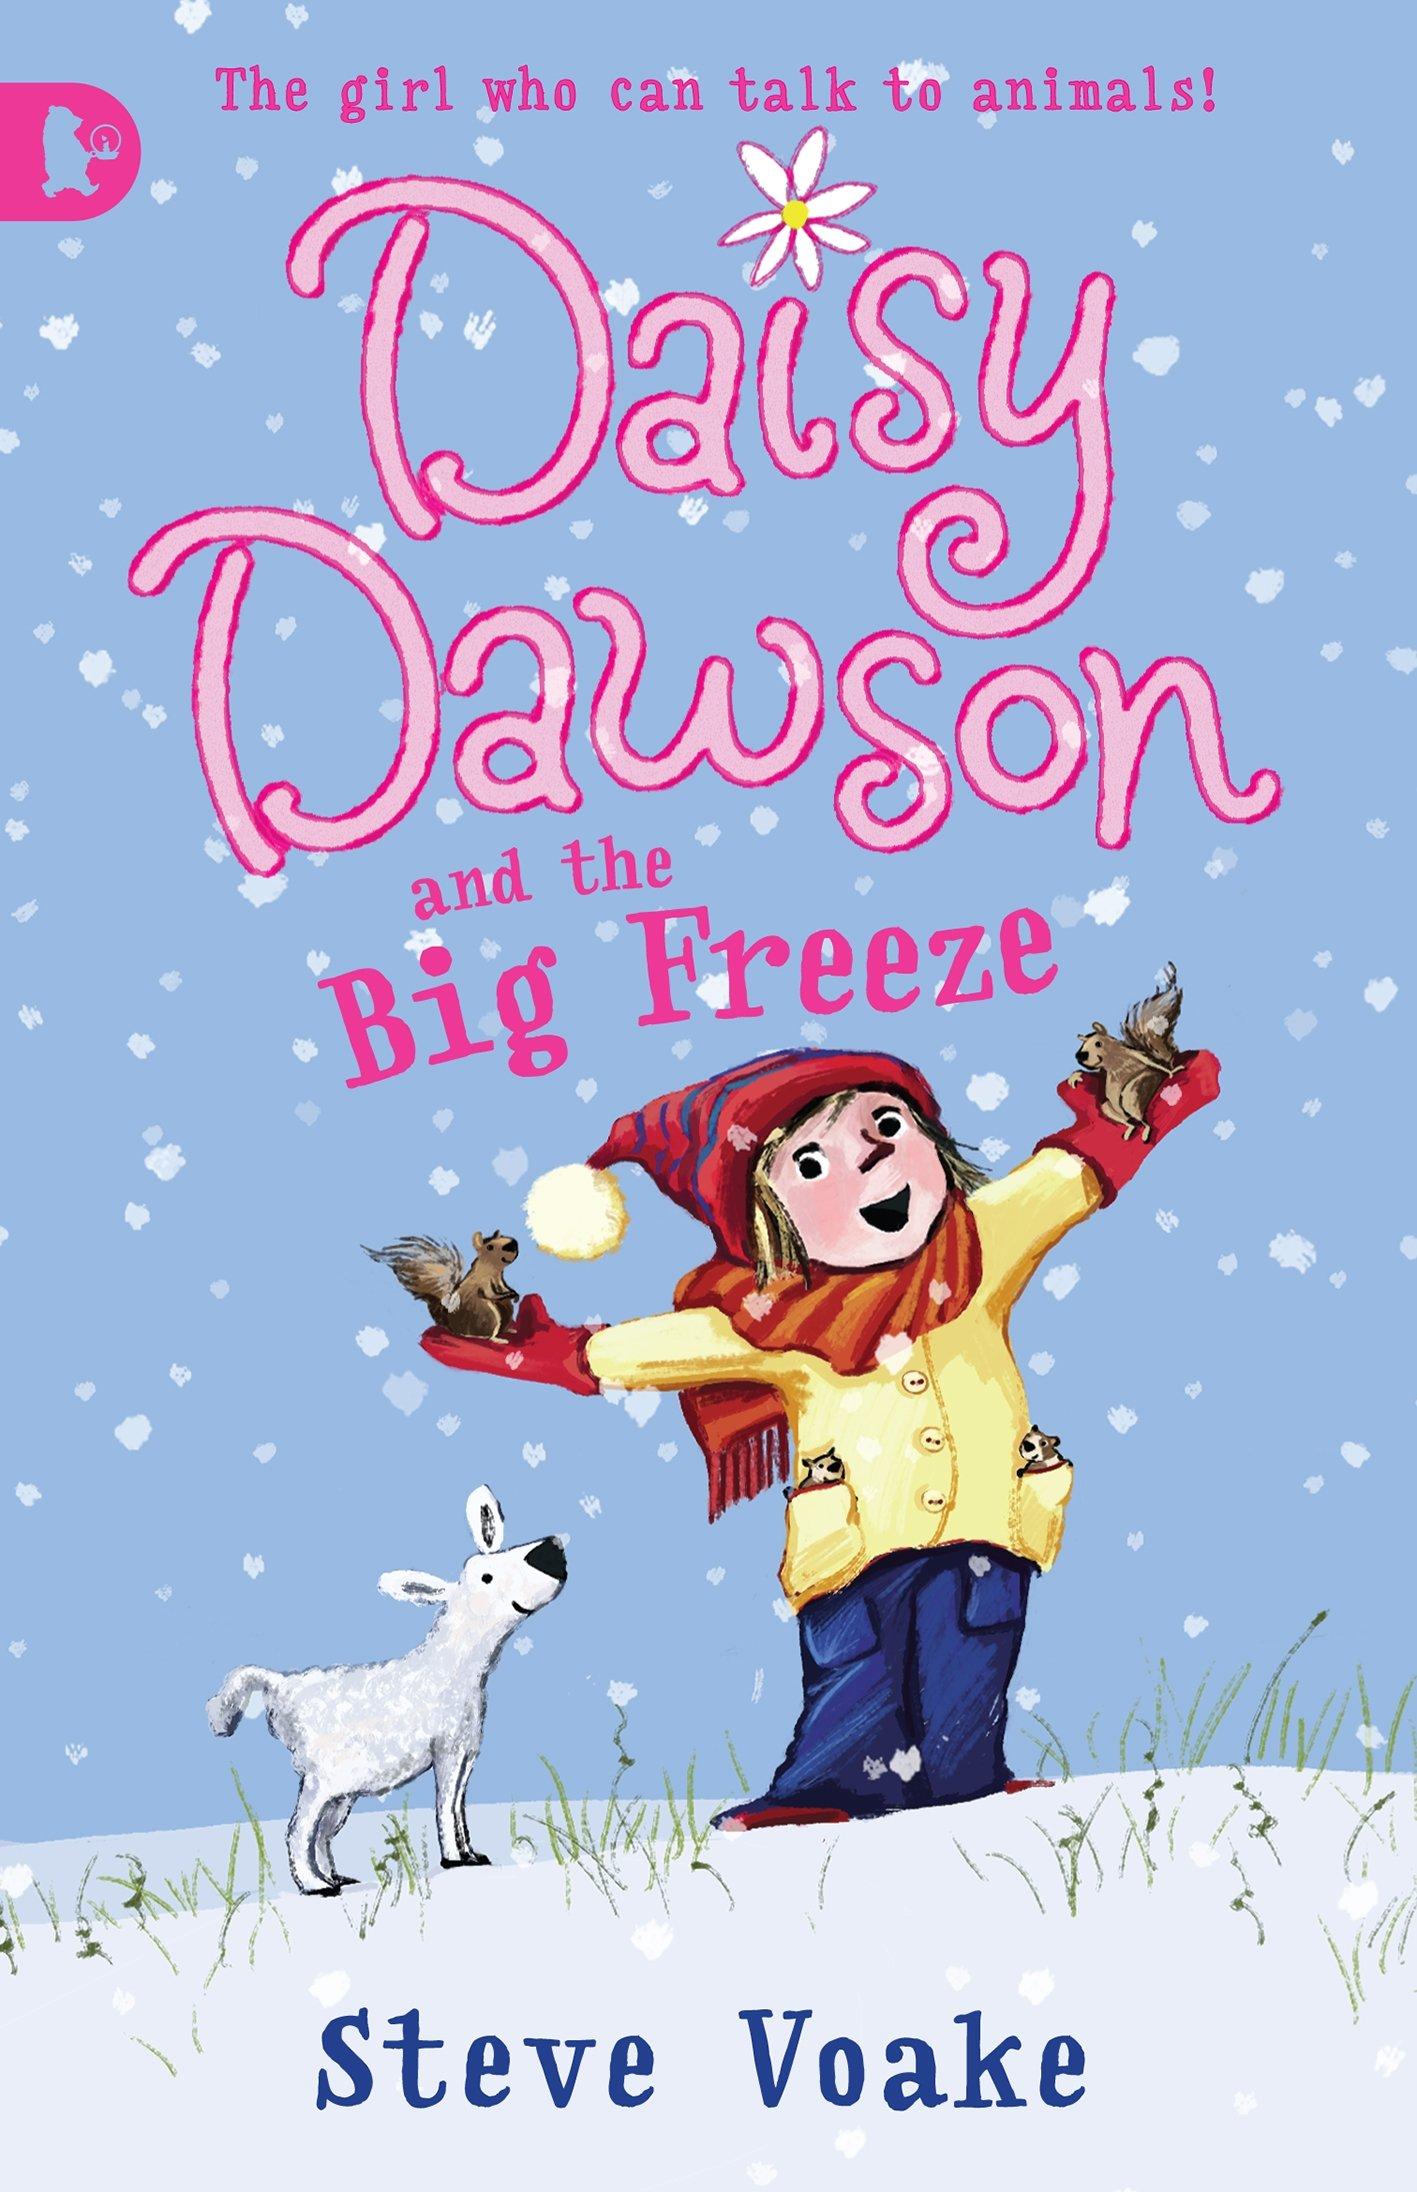 Daisy Dawson and the Big Freeze (Walker Racing Reads): Amazon.co.uk: Steve  Voake, Jessica Meserve: 9781406311020: Books